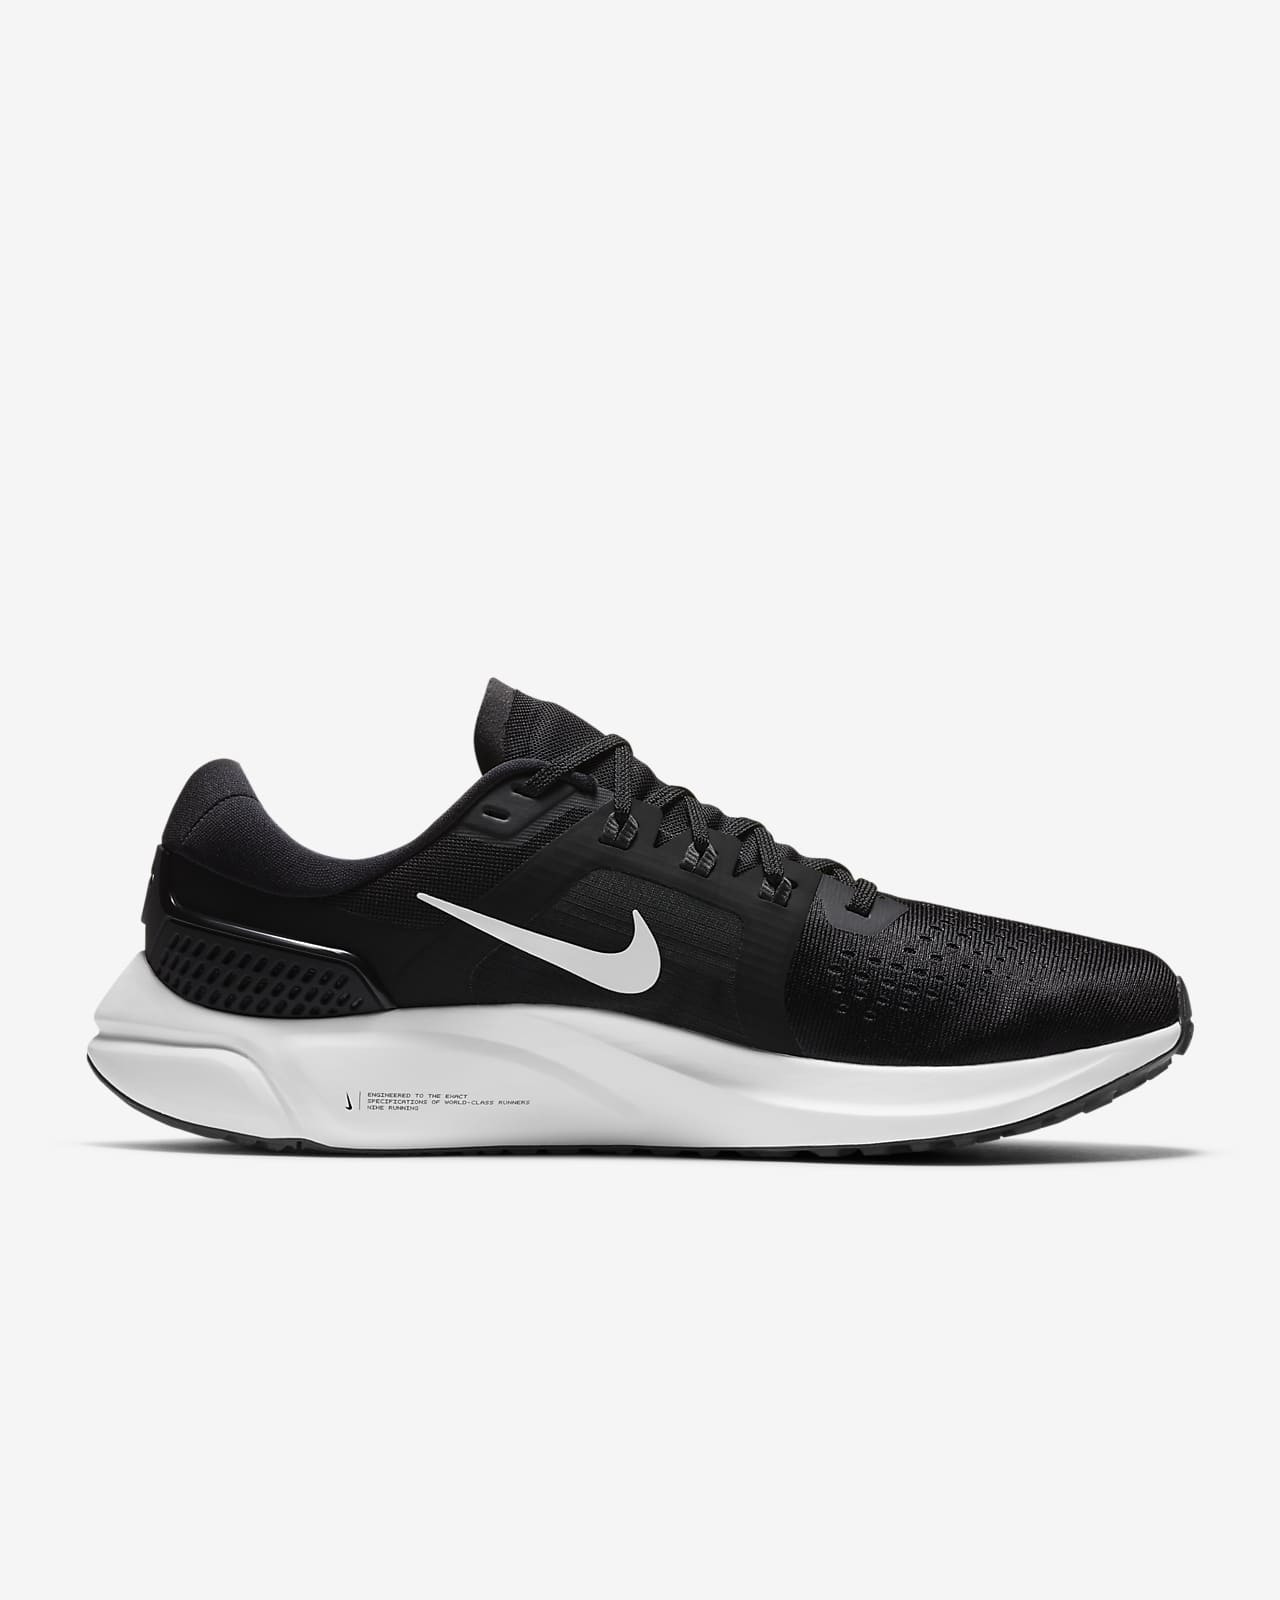 ocupado vacunación ducha  Nike Air Zoom Vomero 15 Men's Running Shoe. Nike ID